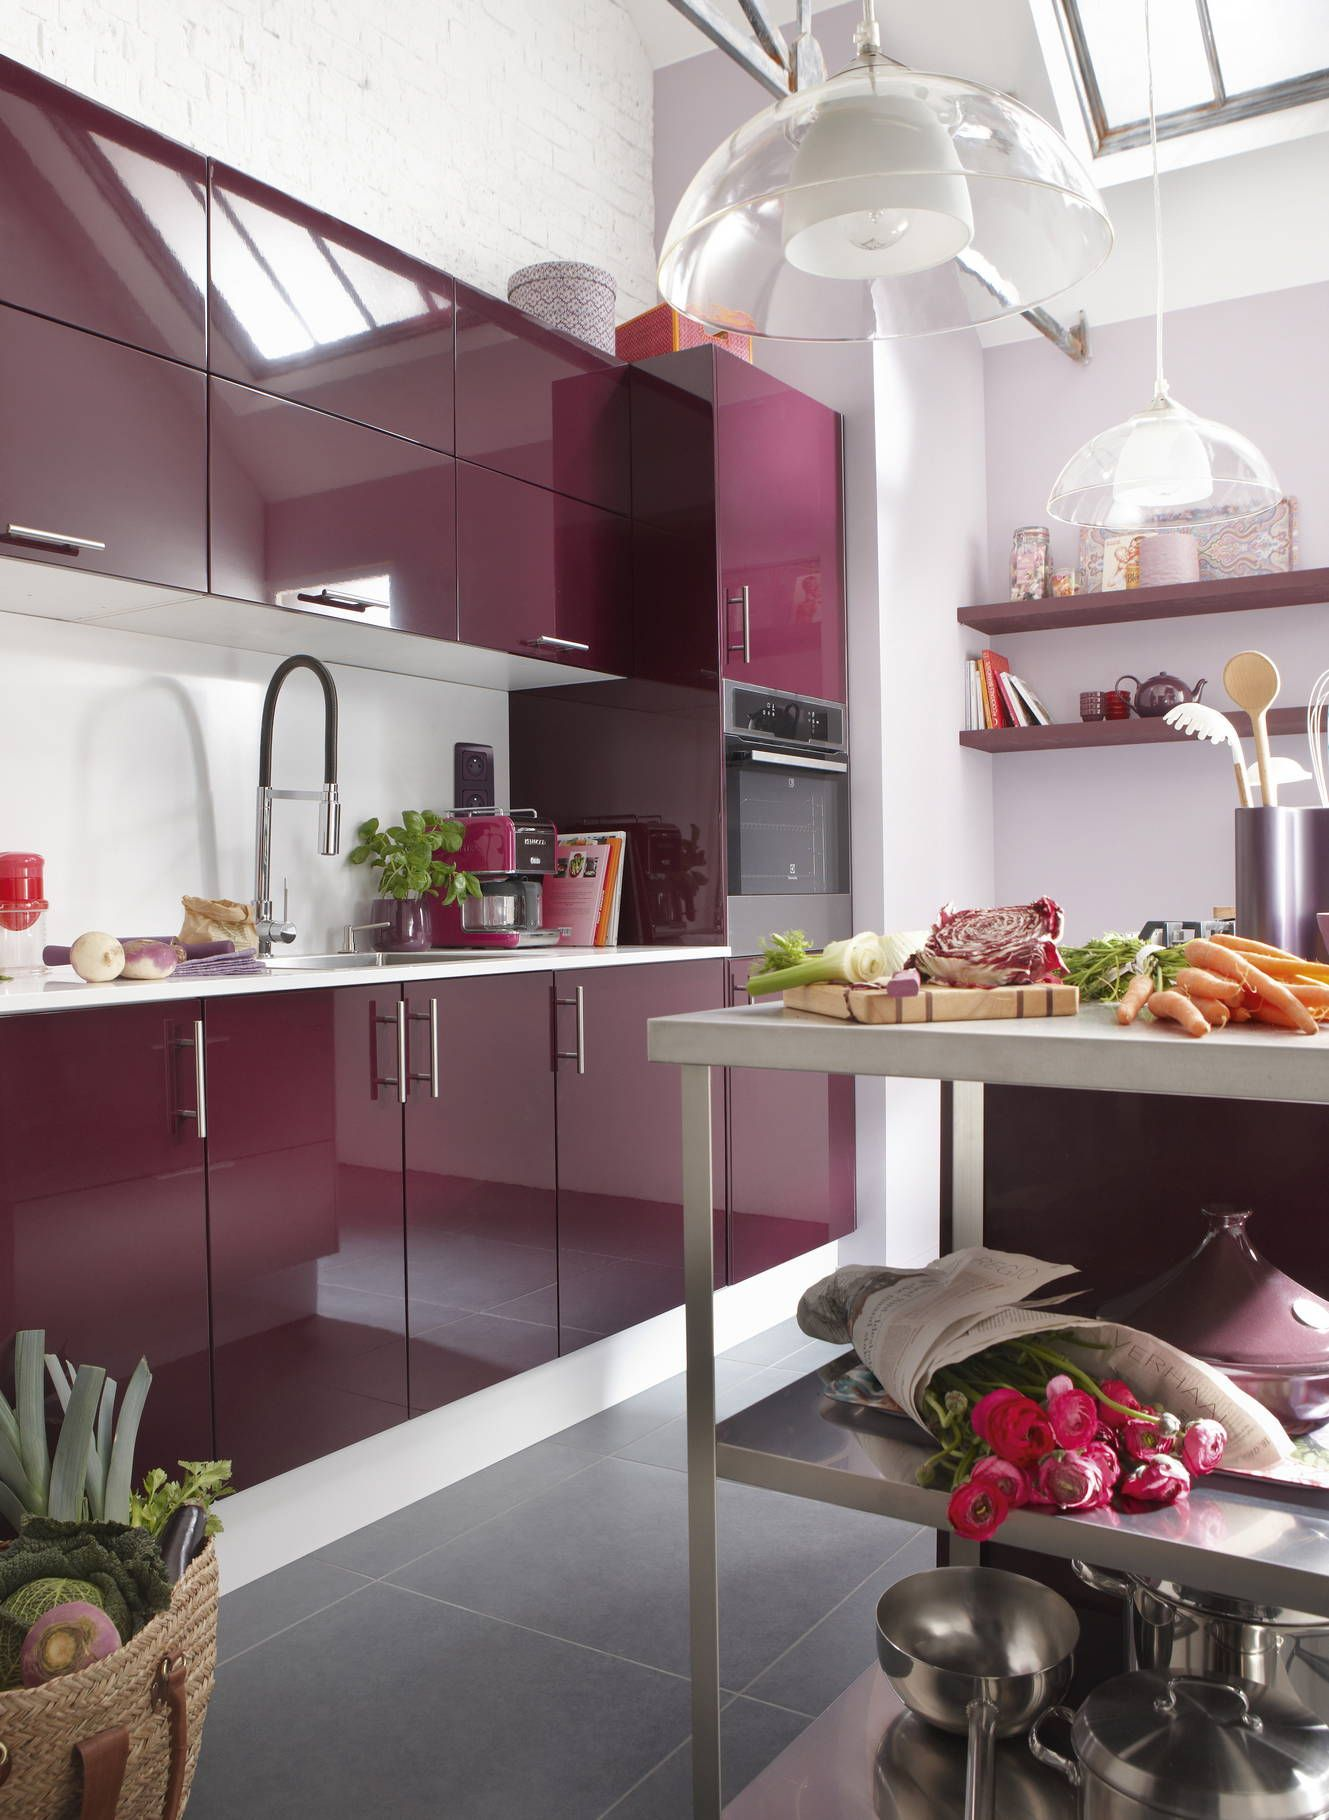 Une cuisine Aubergine pour cuisiner comme un chef  Idee cuisine